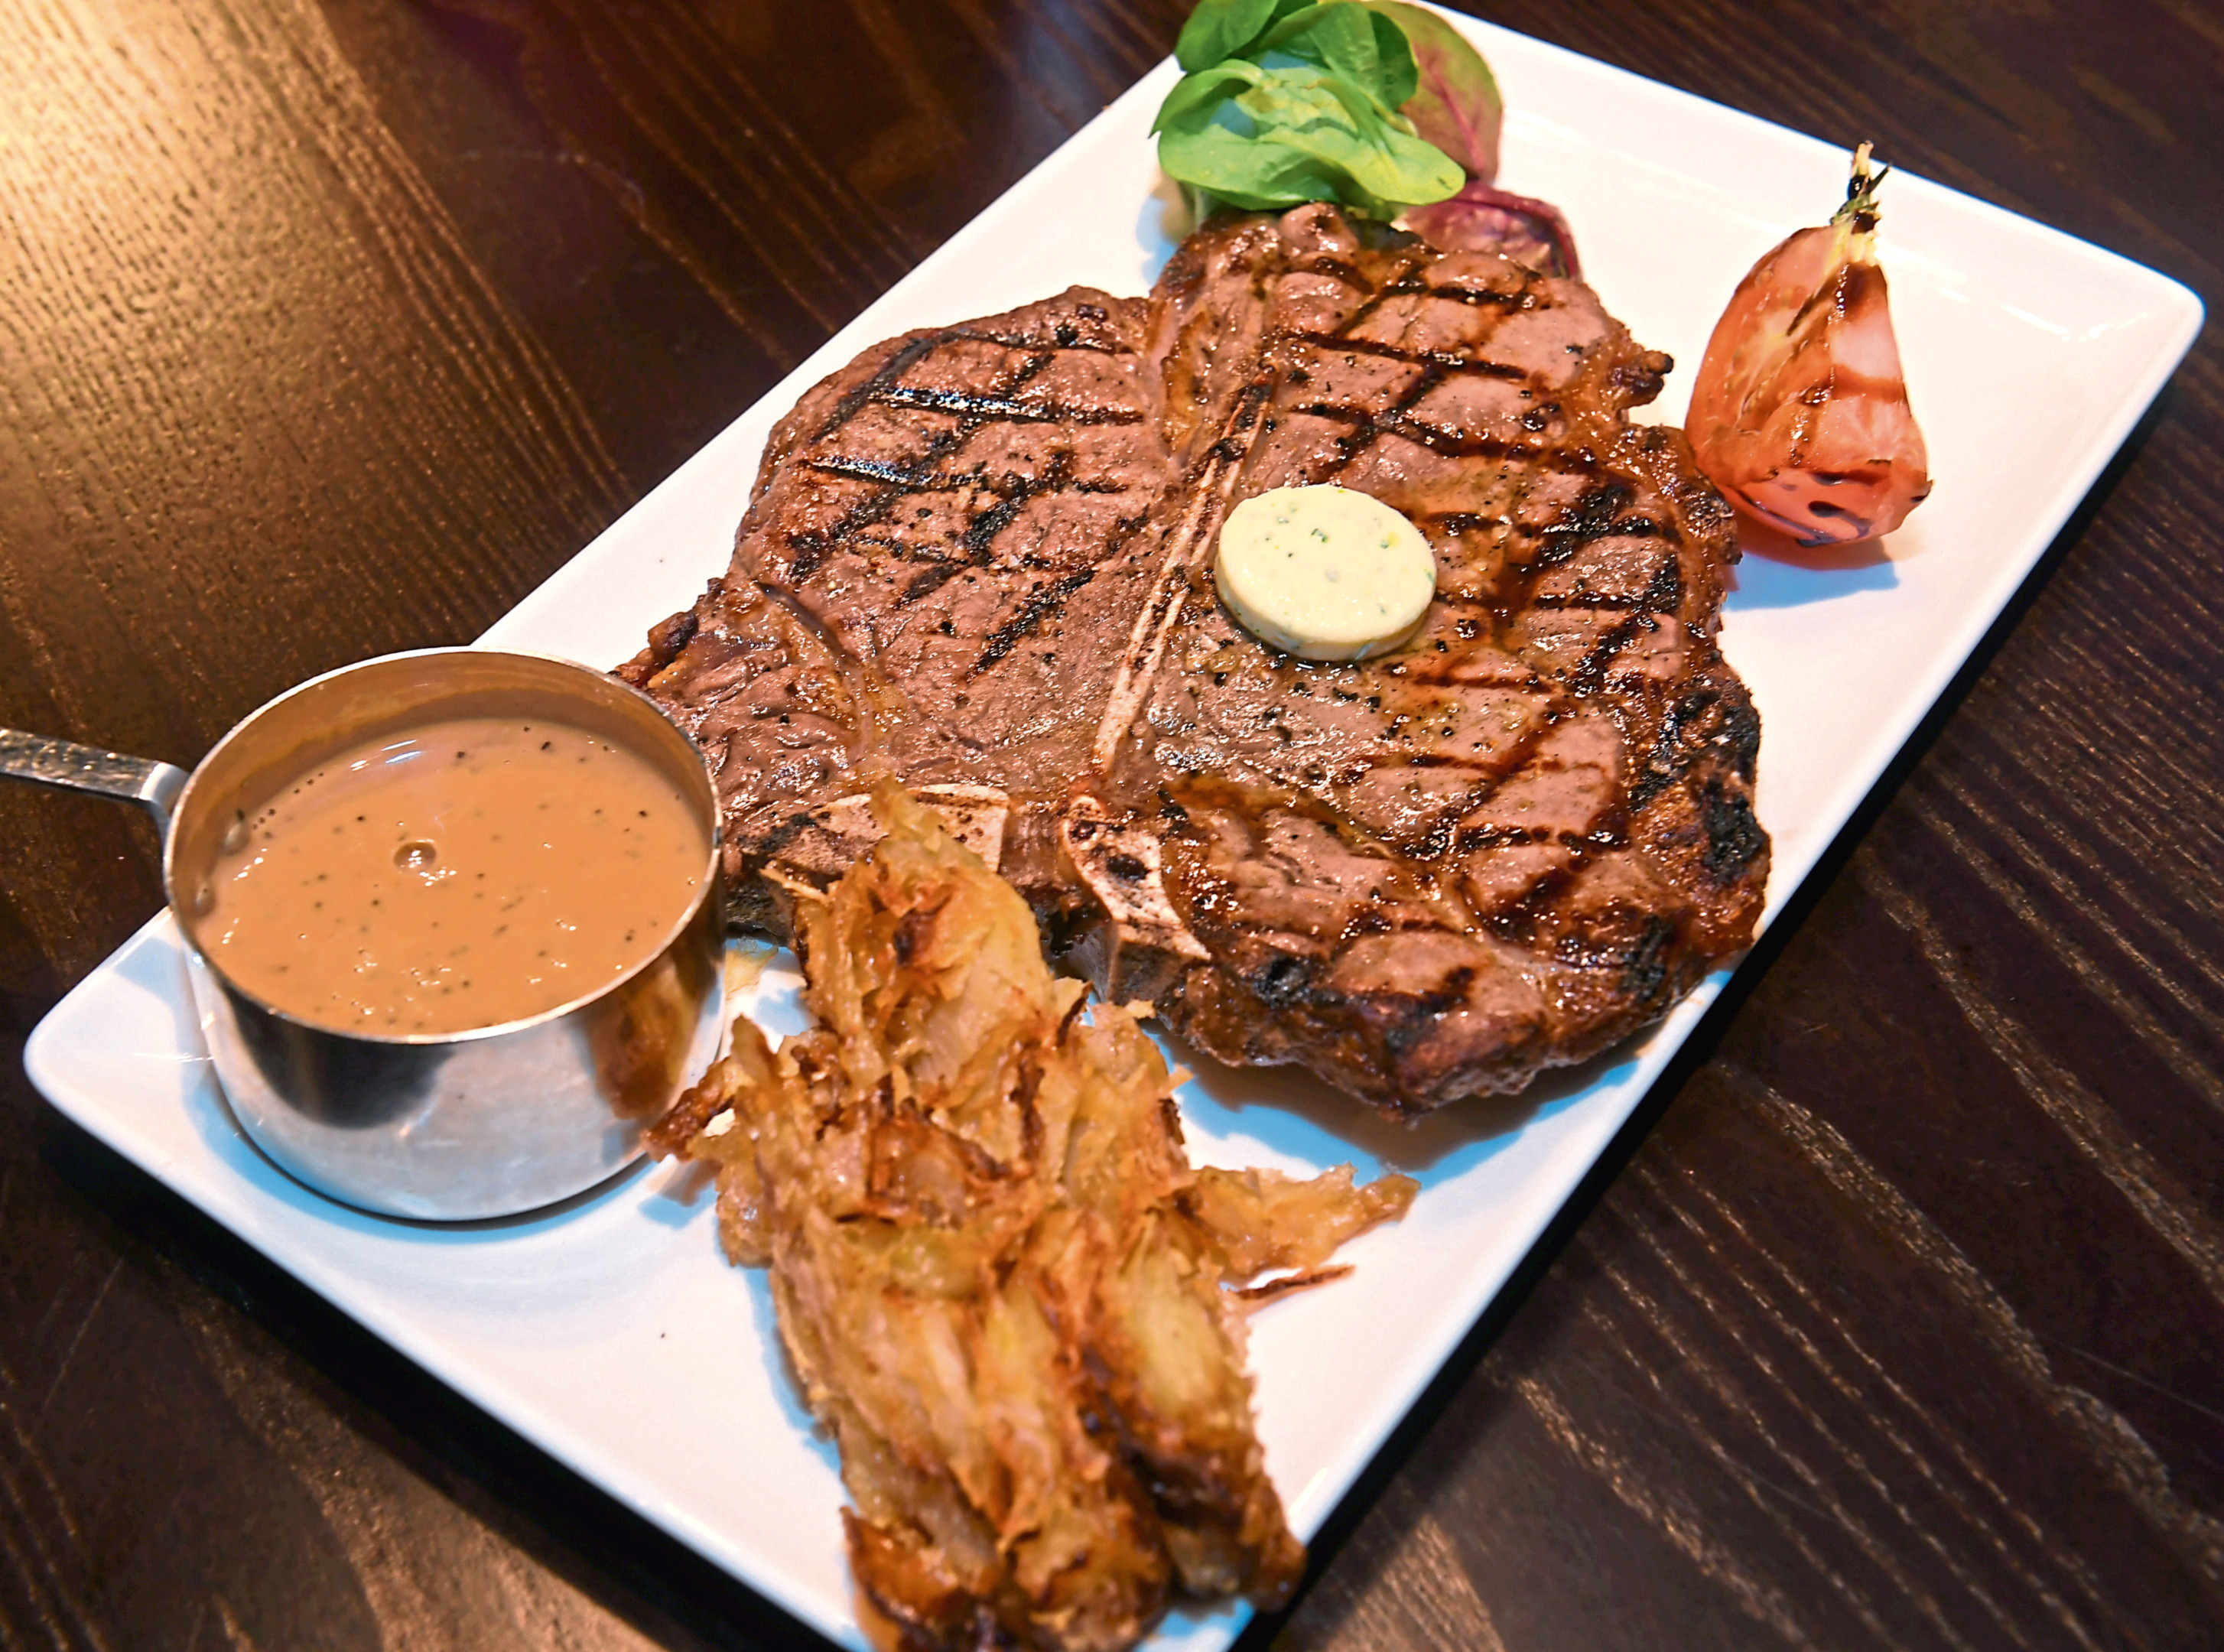 The 20z T-bone steak